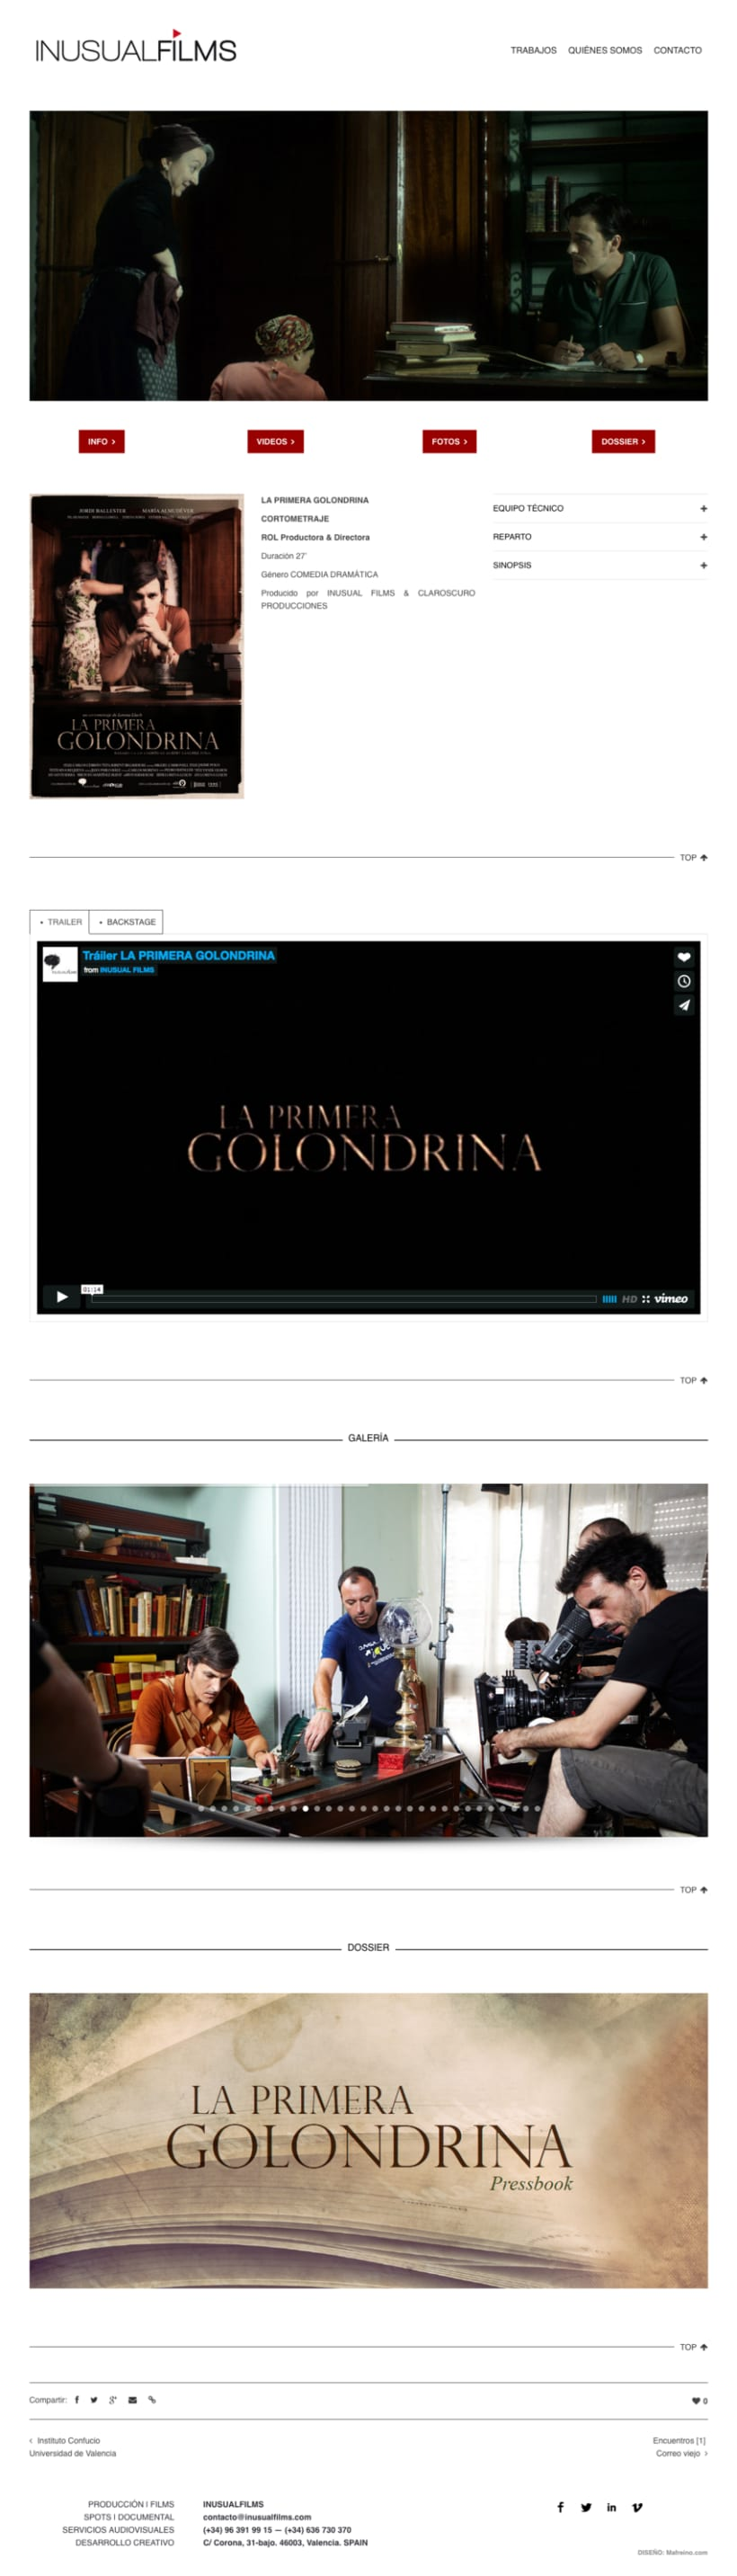 Inusual Films – Diseño web 3